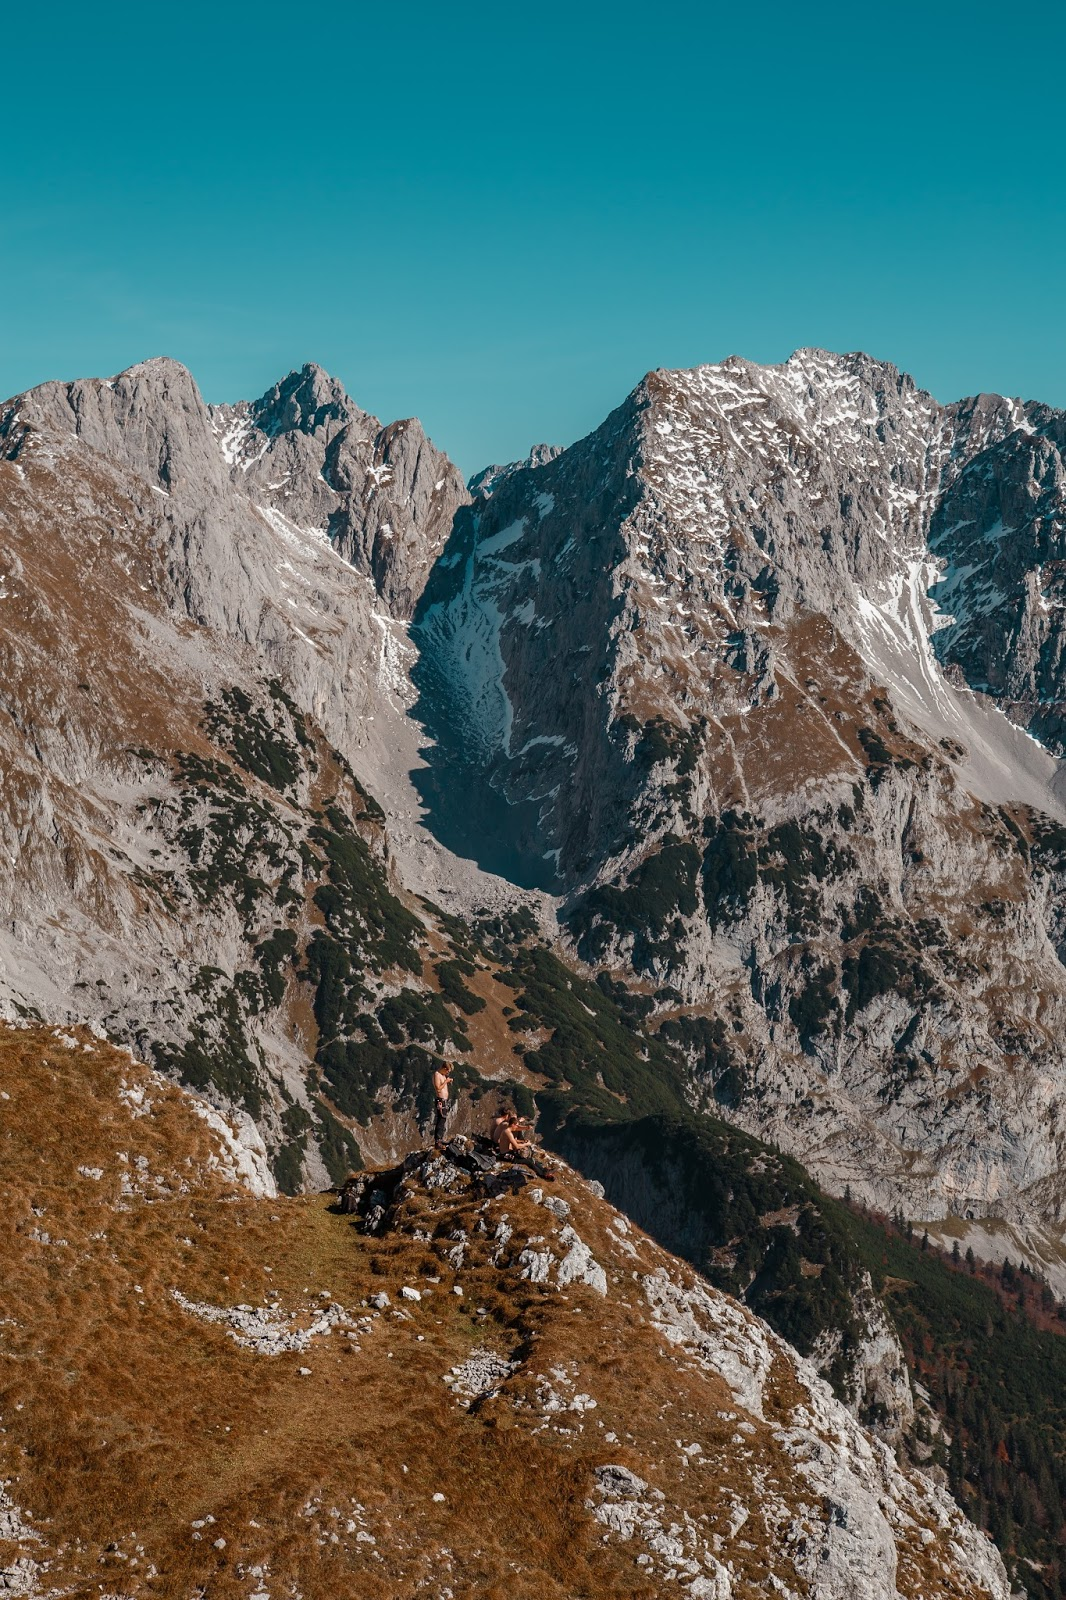 Bergtour Scheffauer  Wandern Wilder Kaiser  leichter Gipfel im Wilden Kaiser  Wandern-Tirol 14